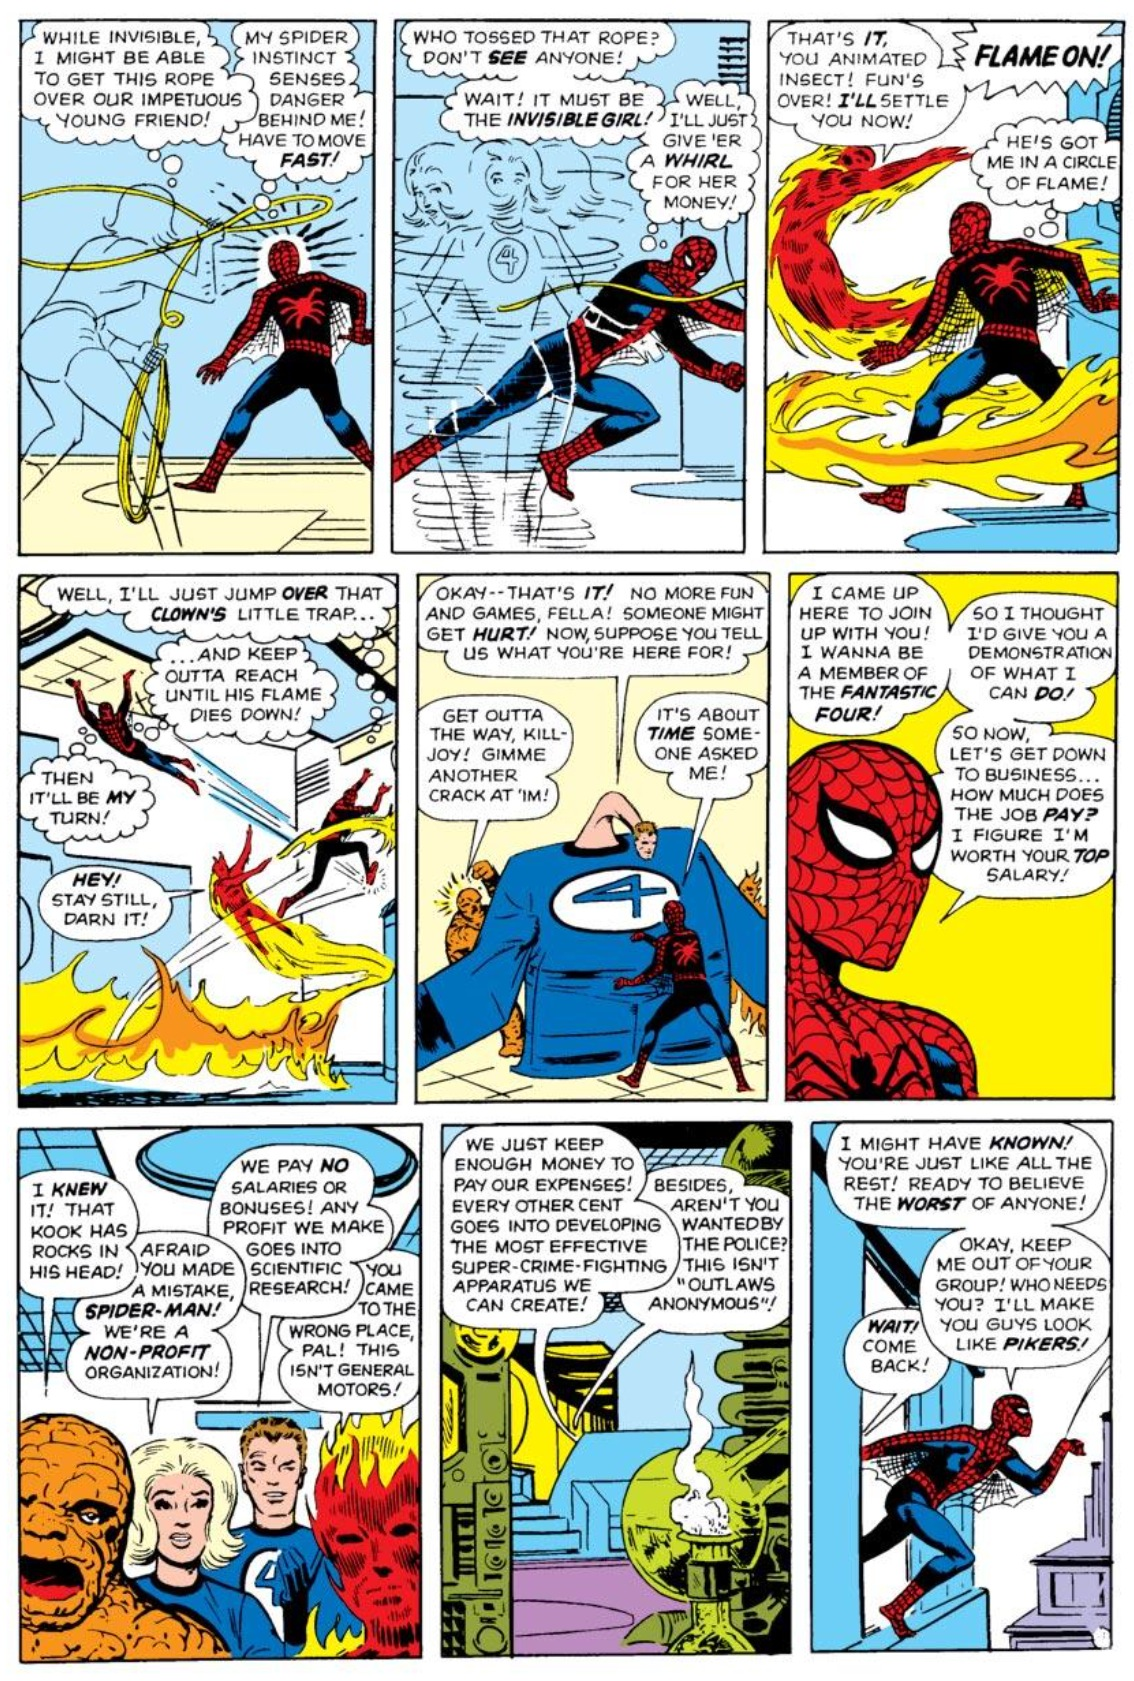 FANTASTIC FOUR #11-LGY #656-ANACLETO SPIDER-MAN Variant